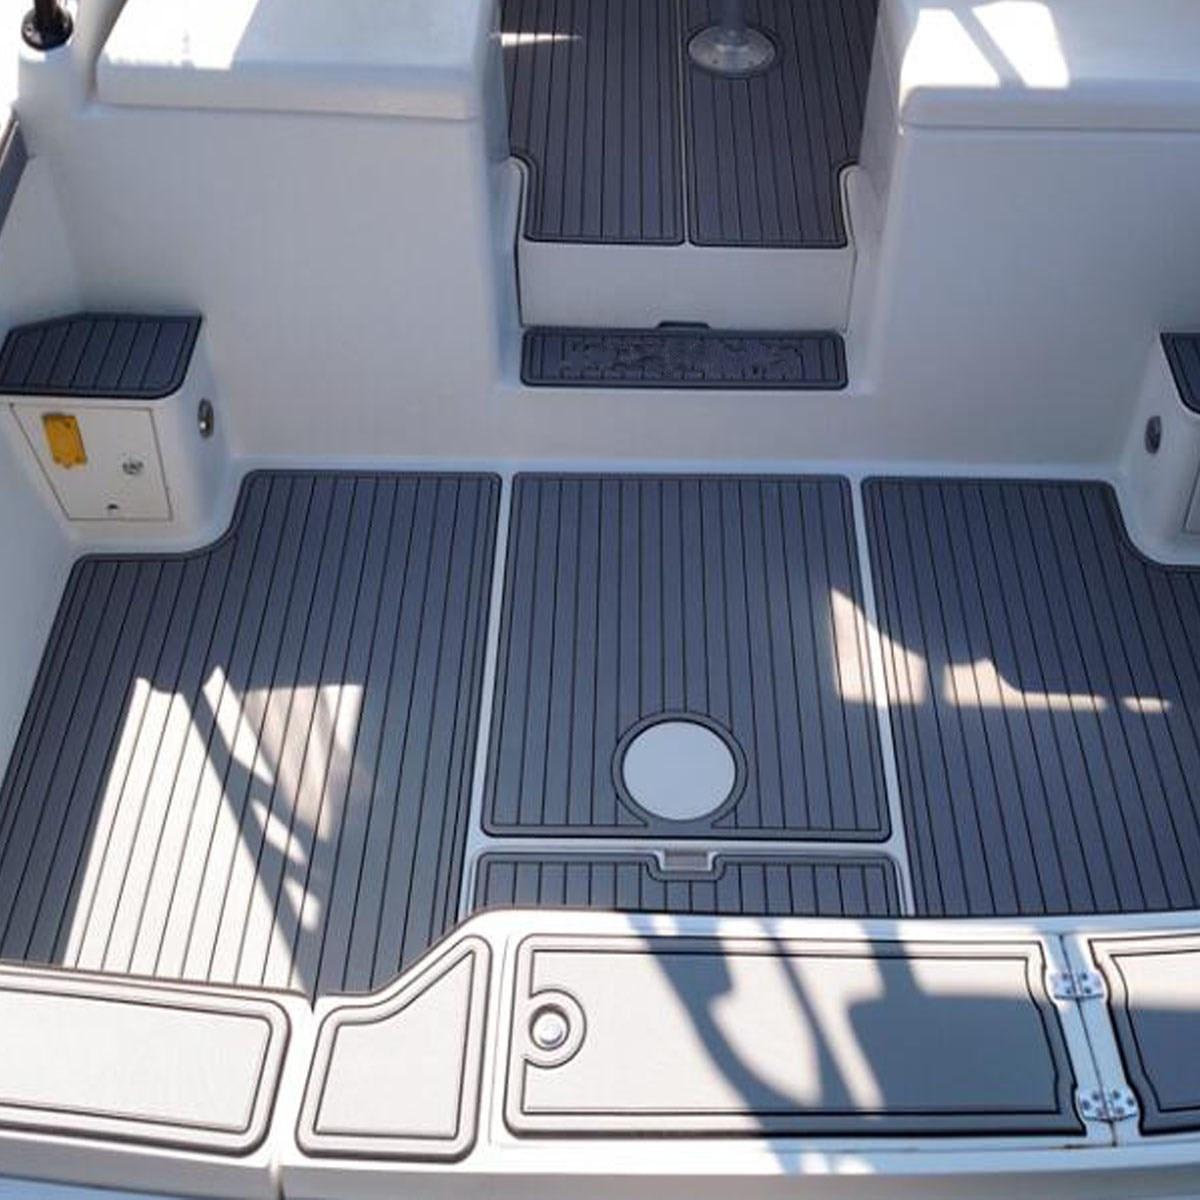 Self-Adhesive 2300x900x6mm Foam Teak Decking EVA Foam Marine Flooring Faux Teak Boat Yacht Accessories Self-Adhesive 2300x900x6mm Foam Teak Decking EVA Foam Marine Flooring Faux Teak Boat Yacht Accessories